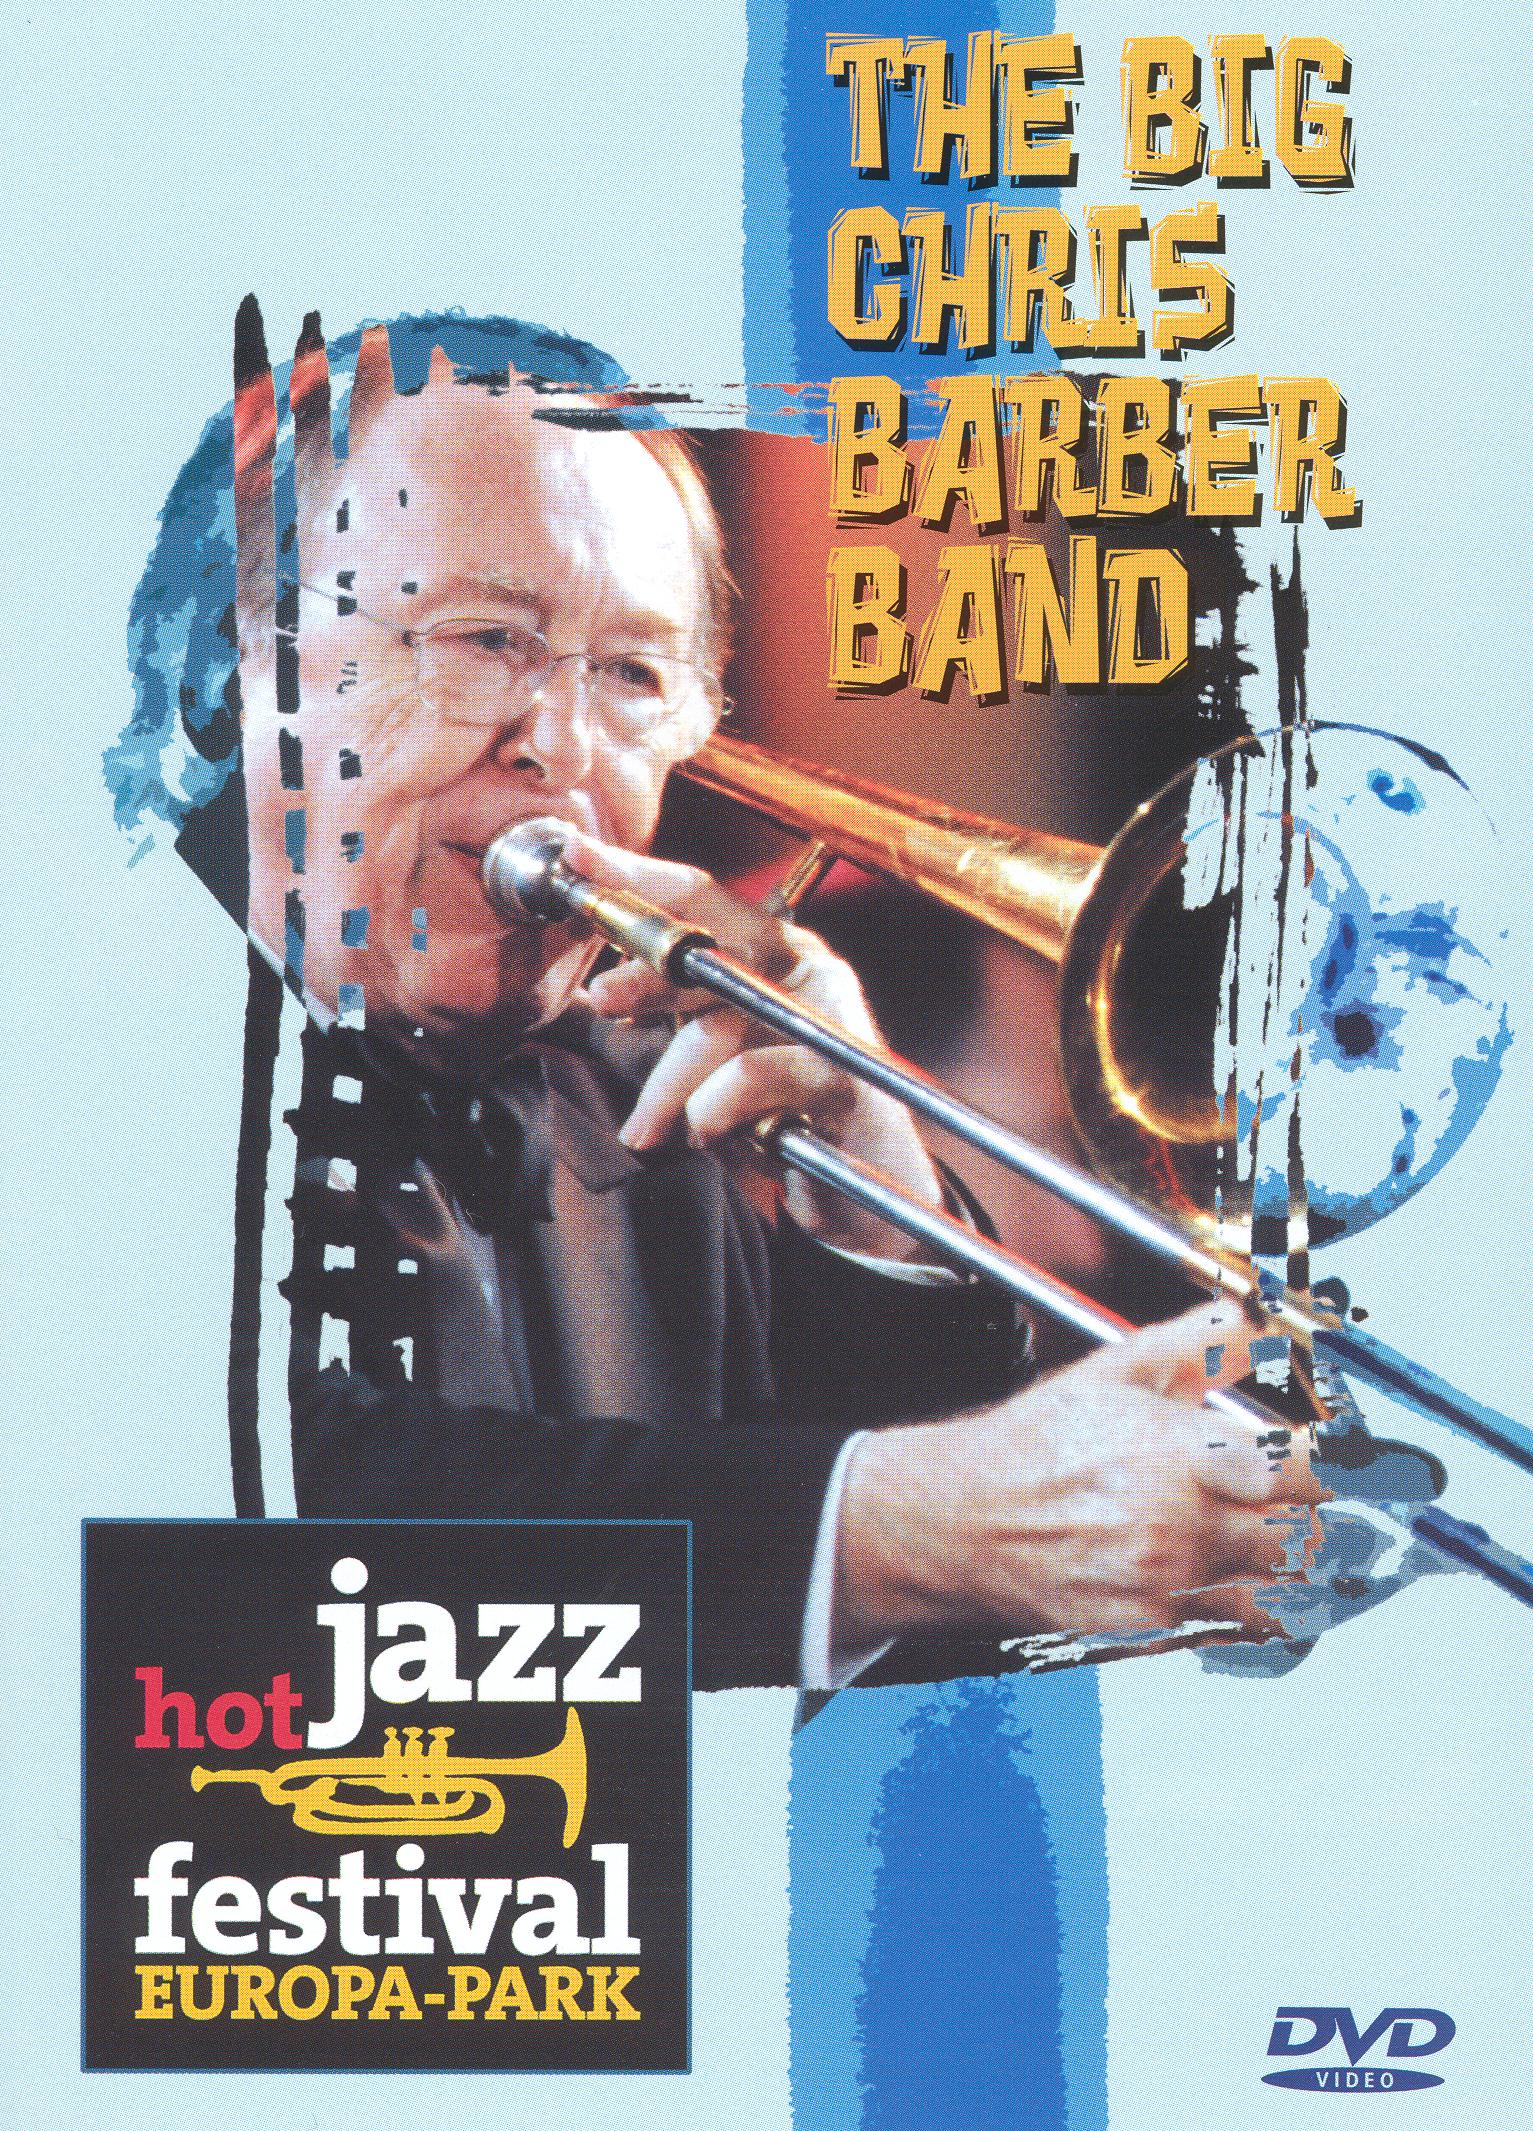 The Big Chris Barber Band: Hot Jazz Festival - Europa-Park